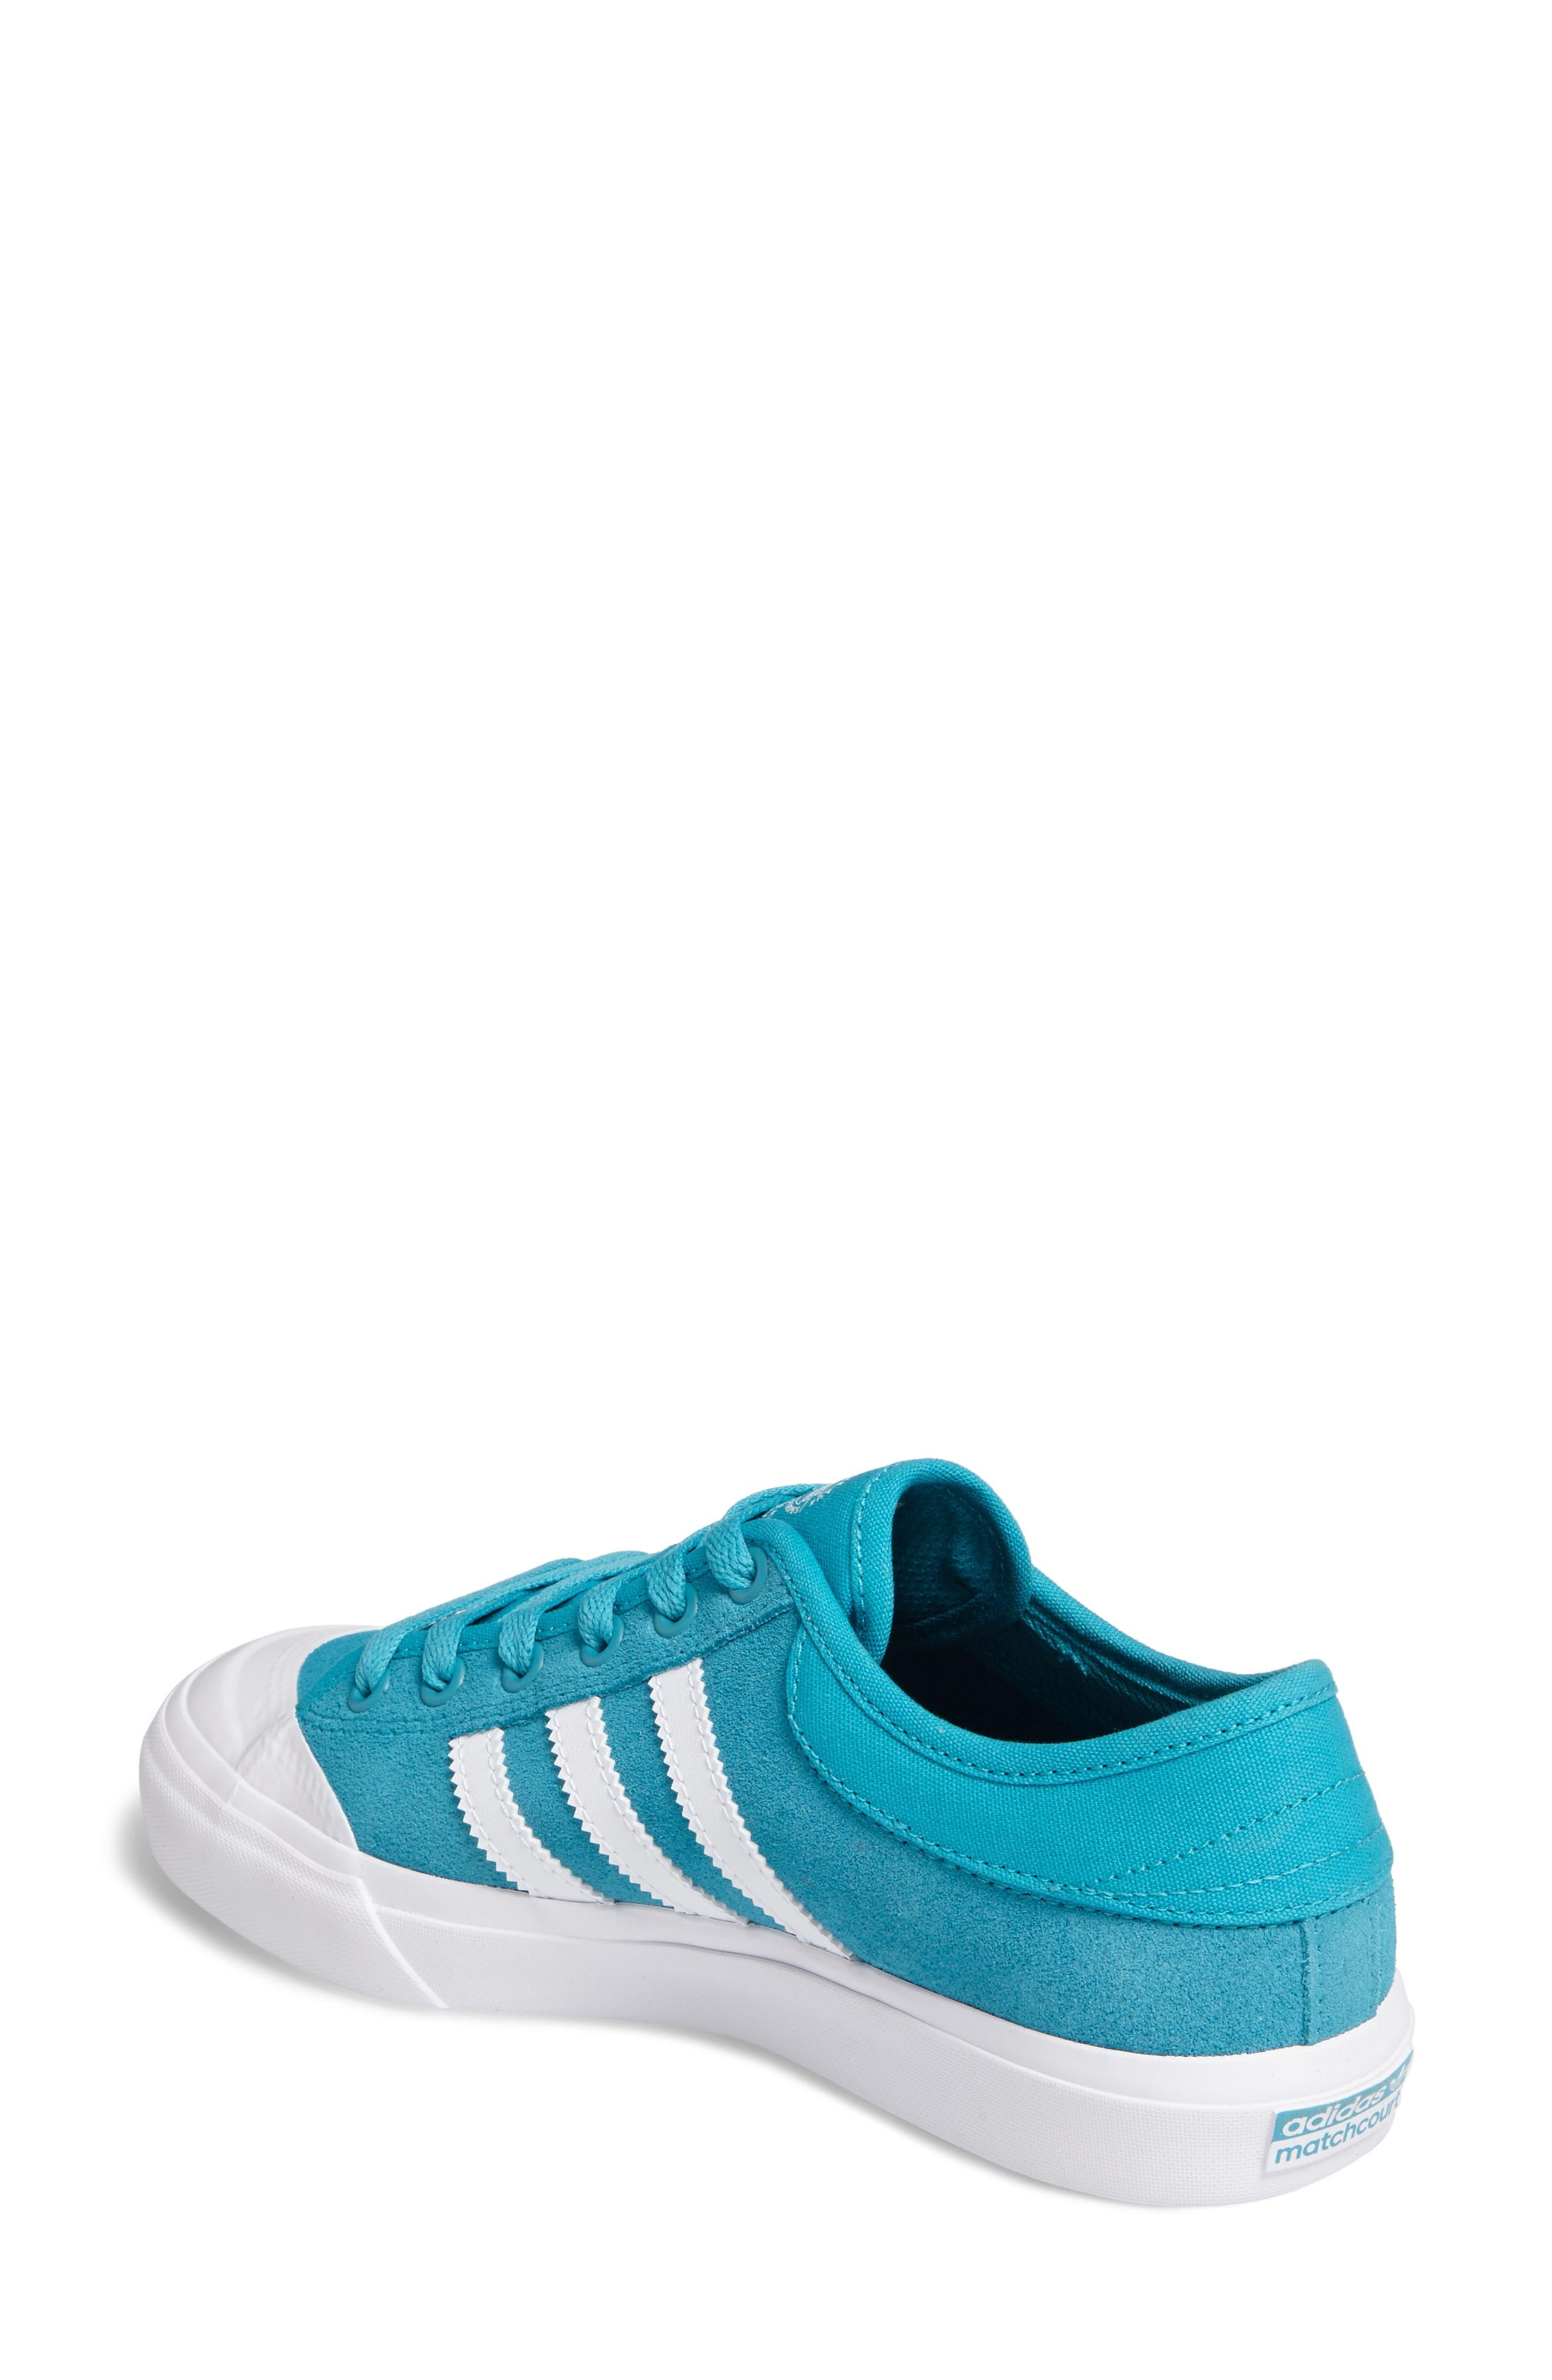 ADIDAS,                             Matchcourt Mid High Sneaker,                             Alternate thumbnail 2, color,                             400